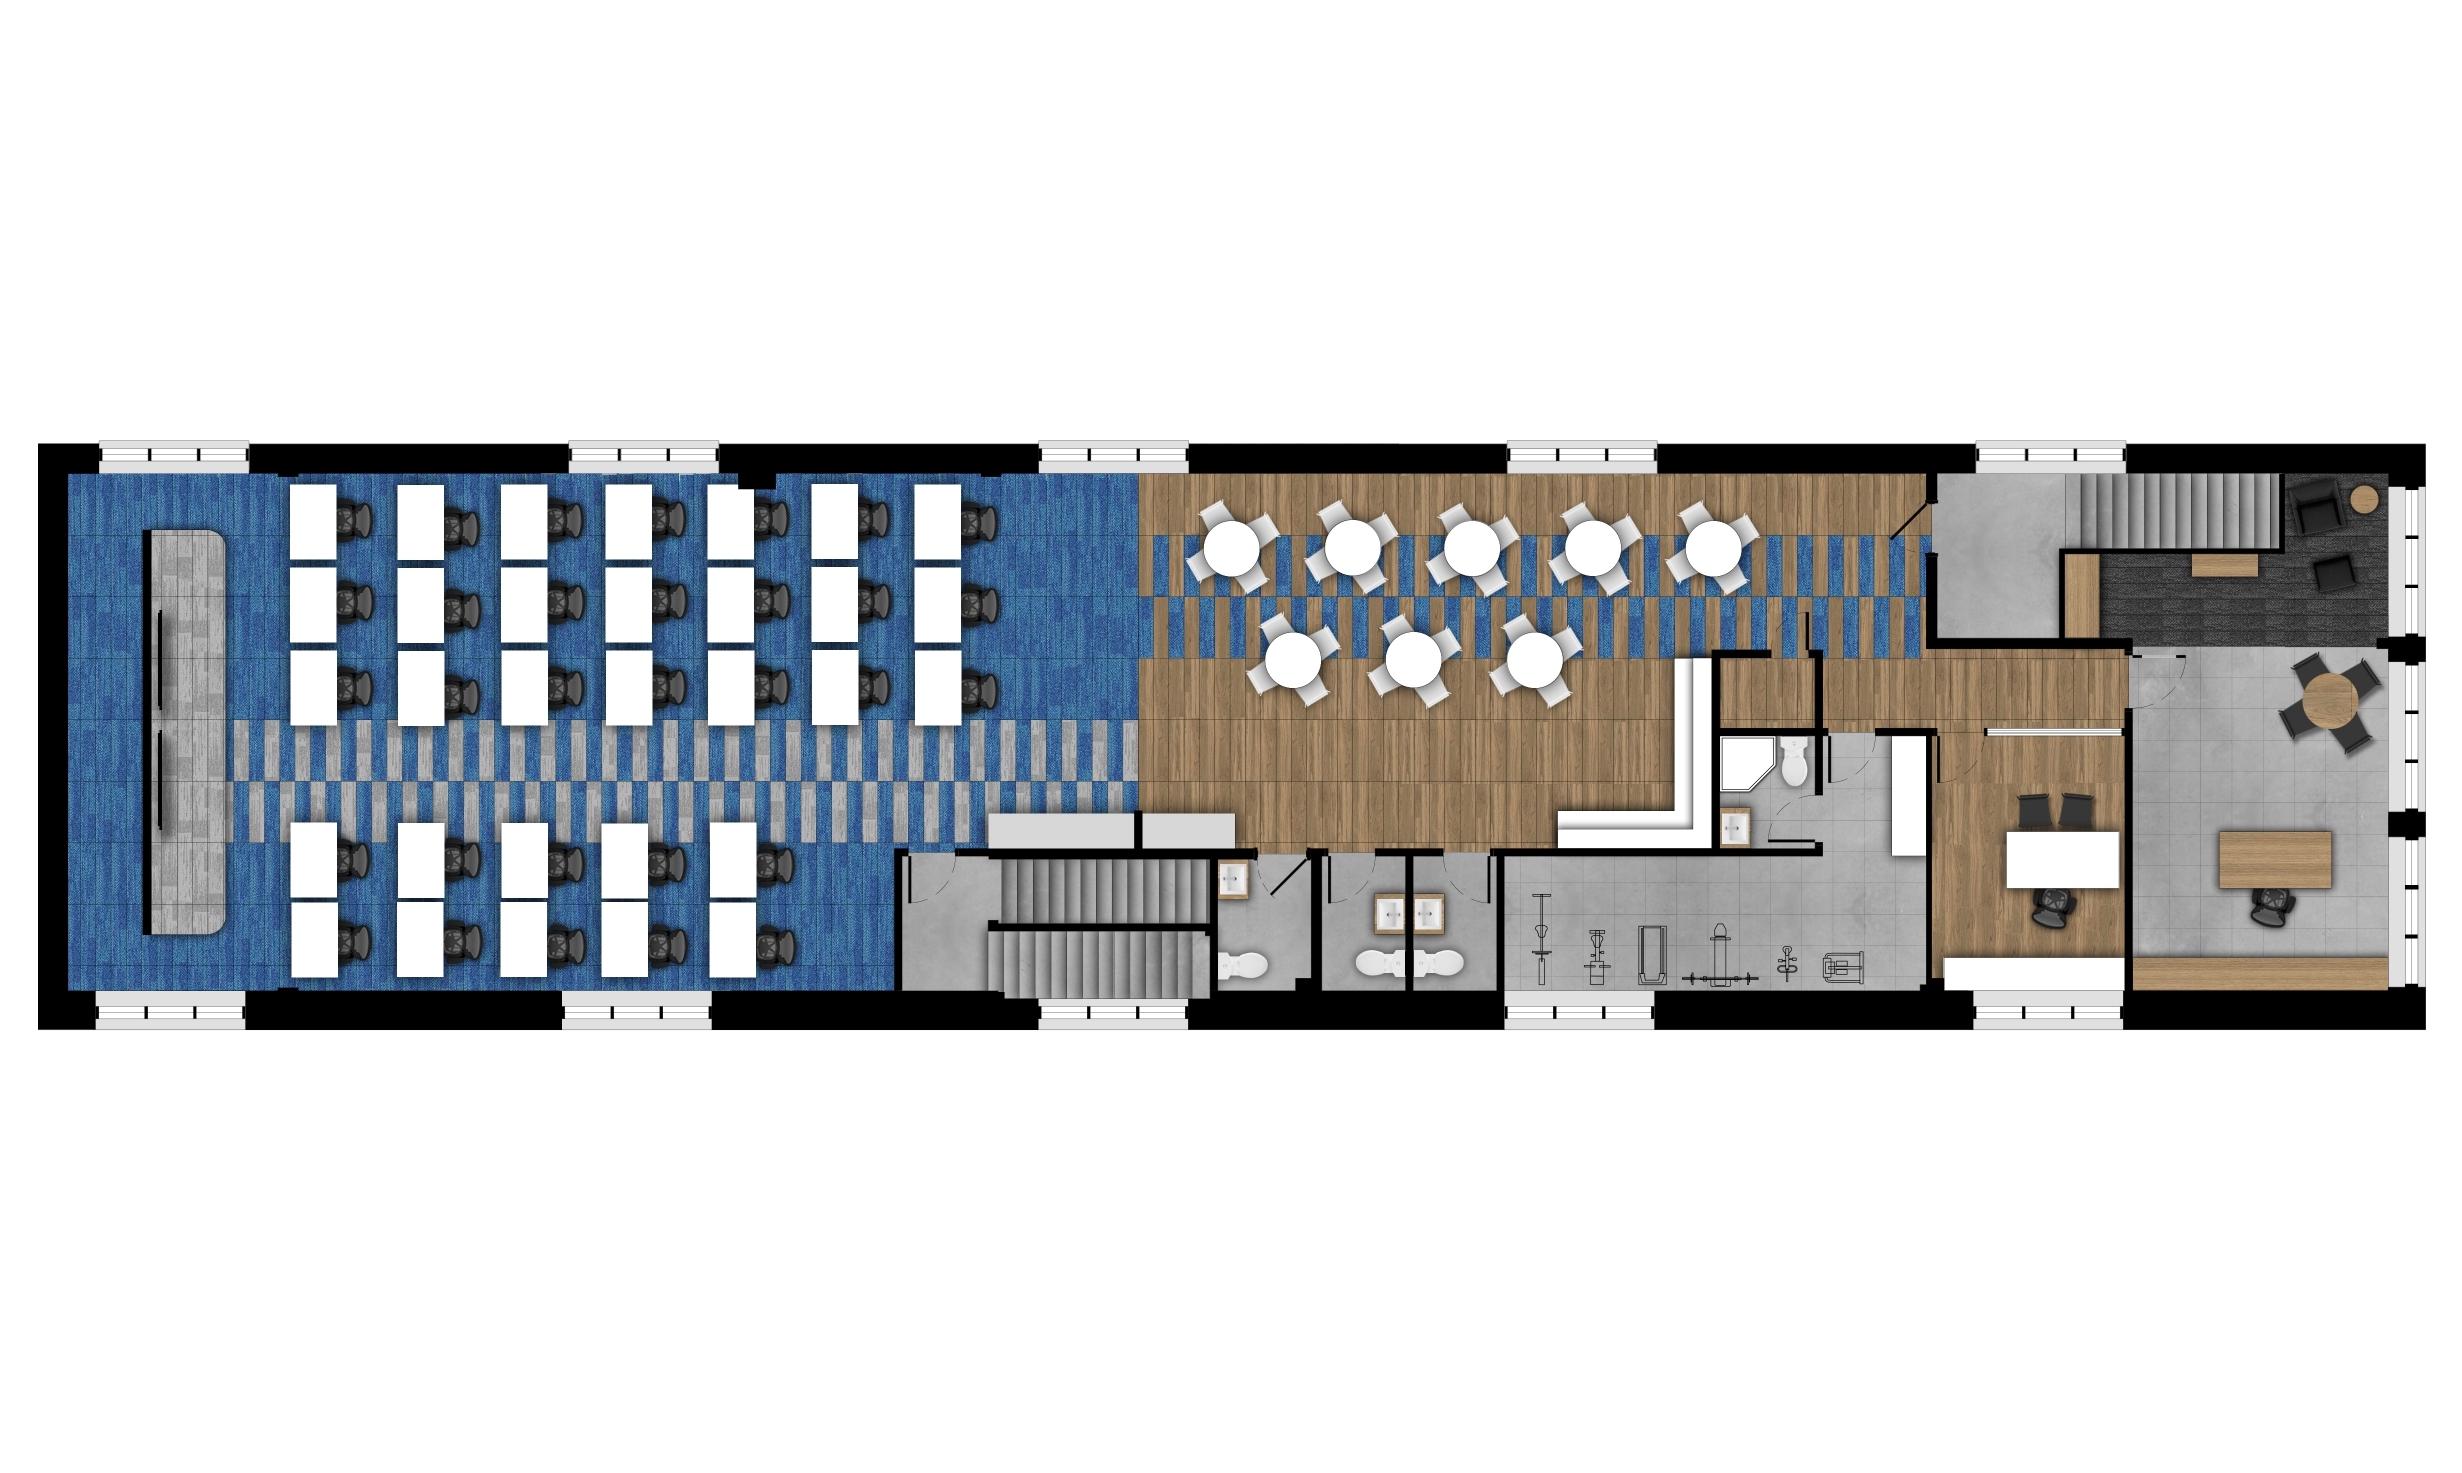 Plan d'aménagement - niveau 3